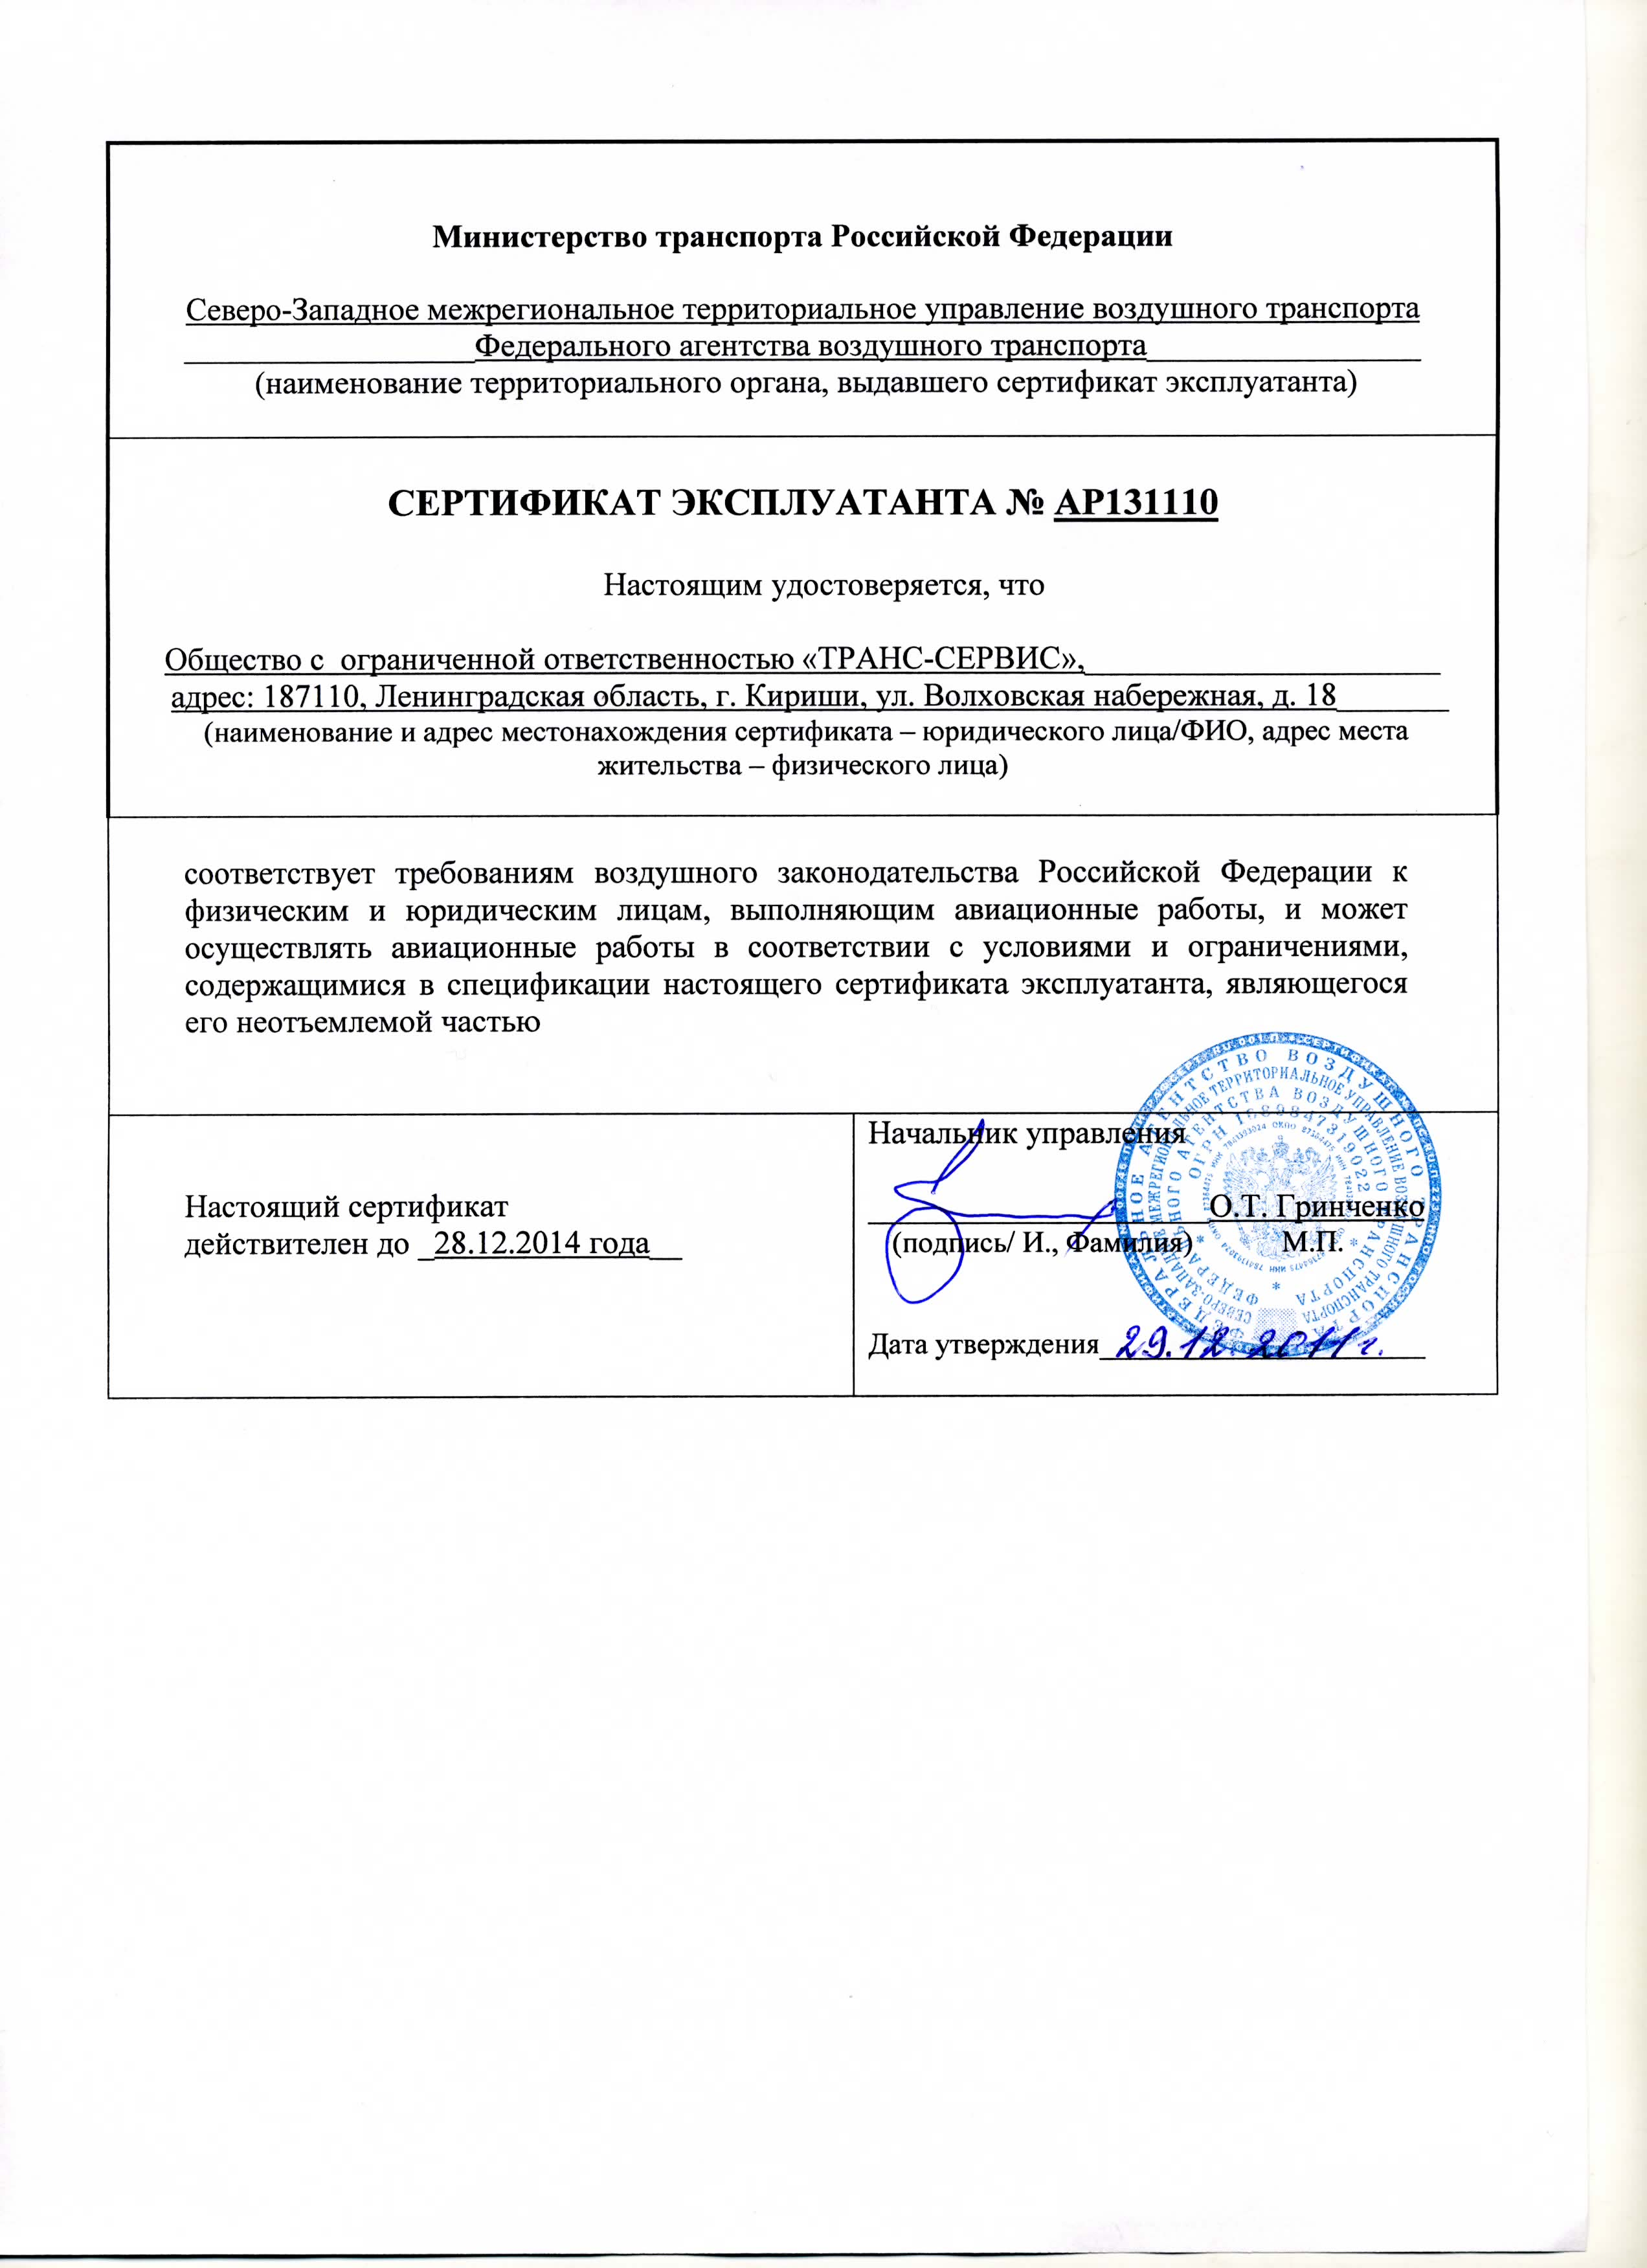 Registration Certificate Certificate of Registration of